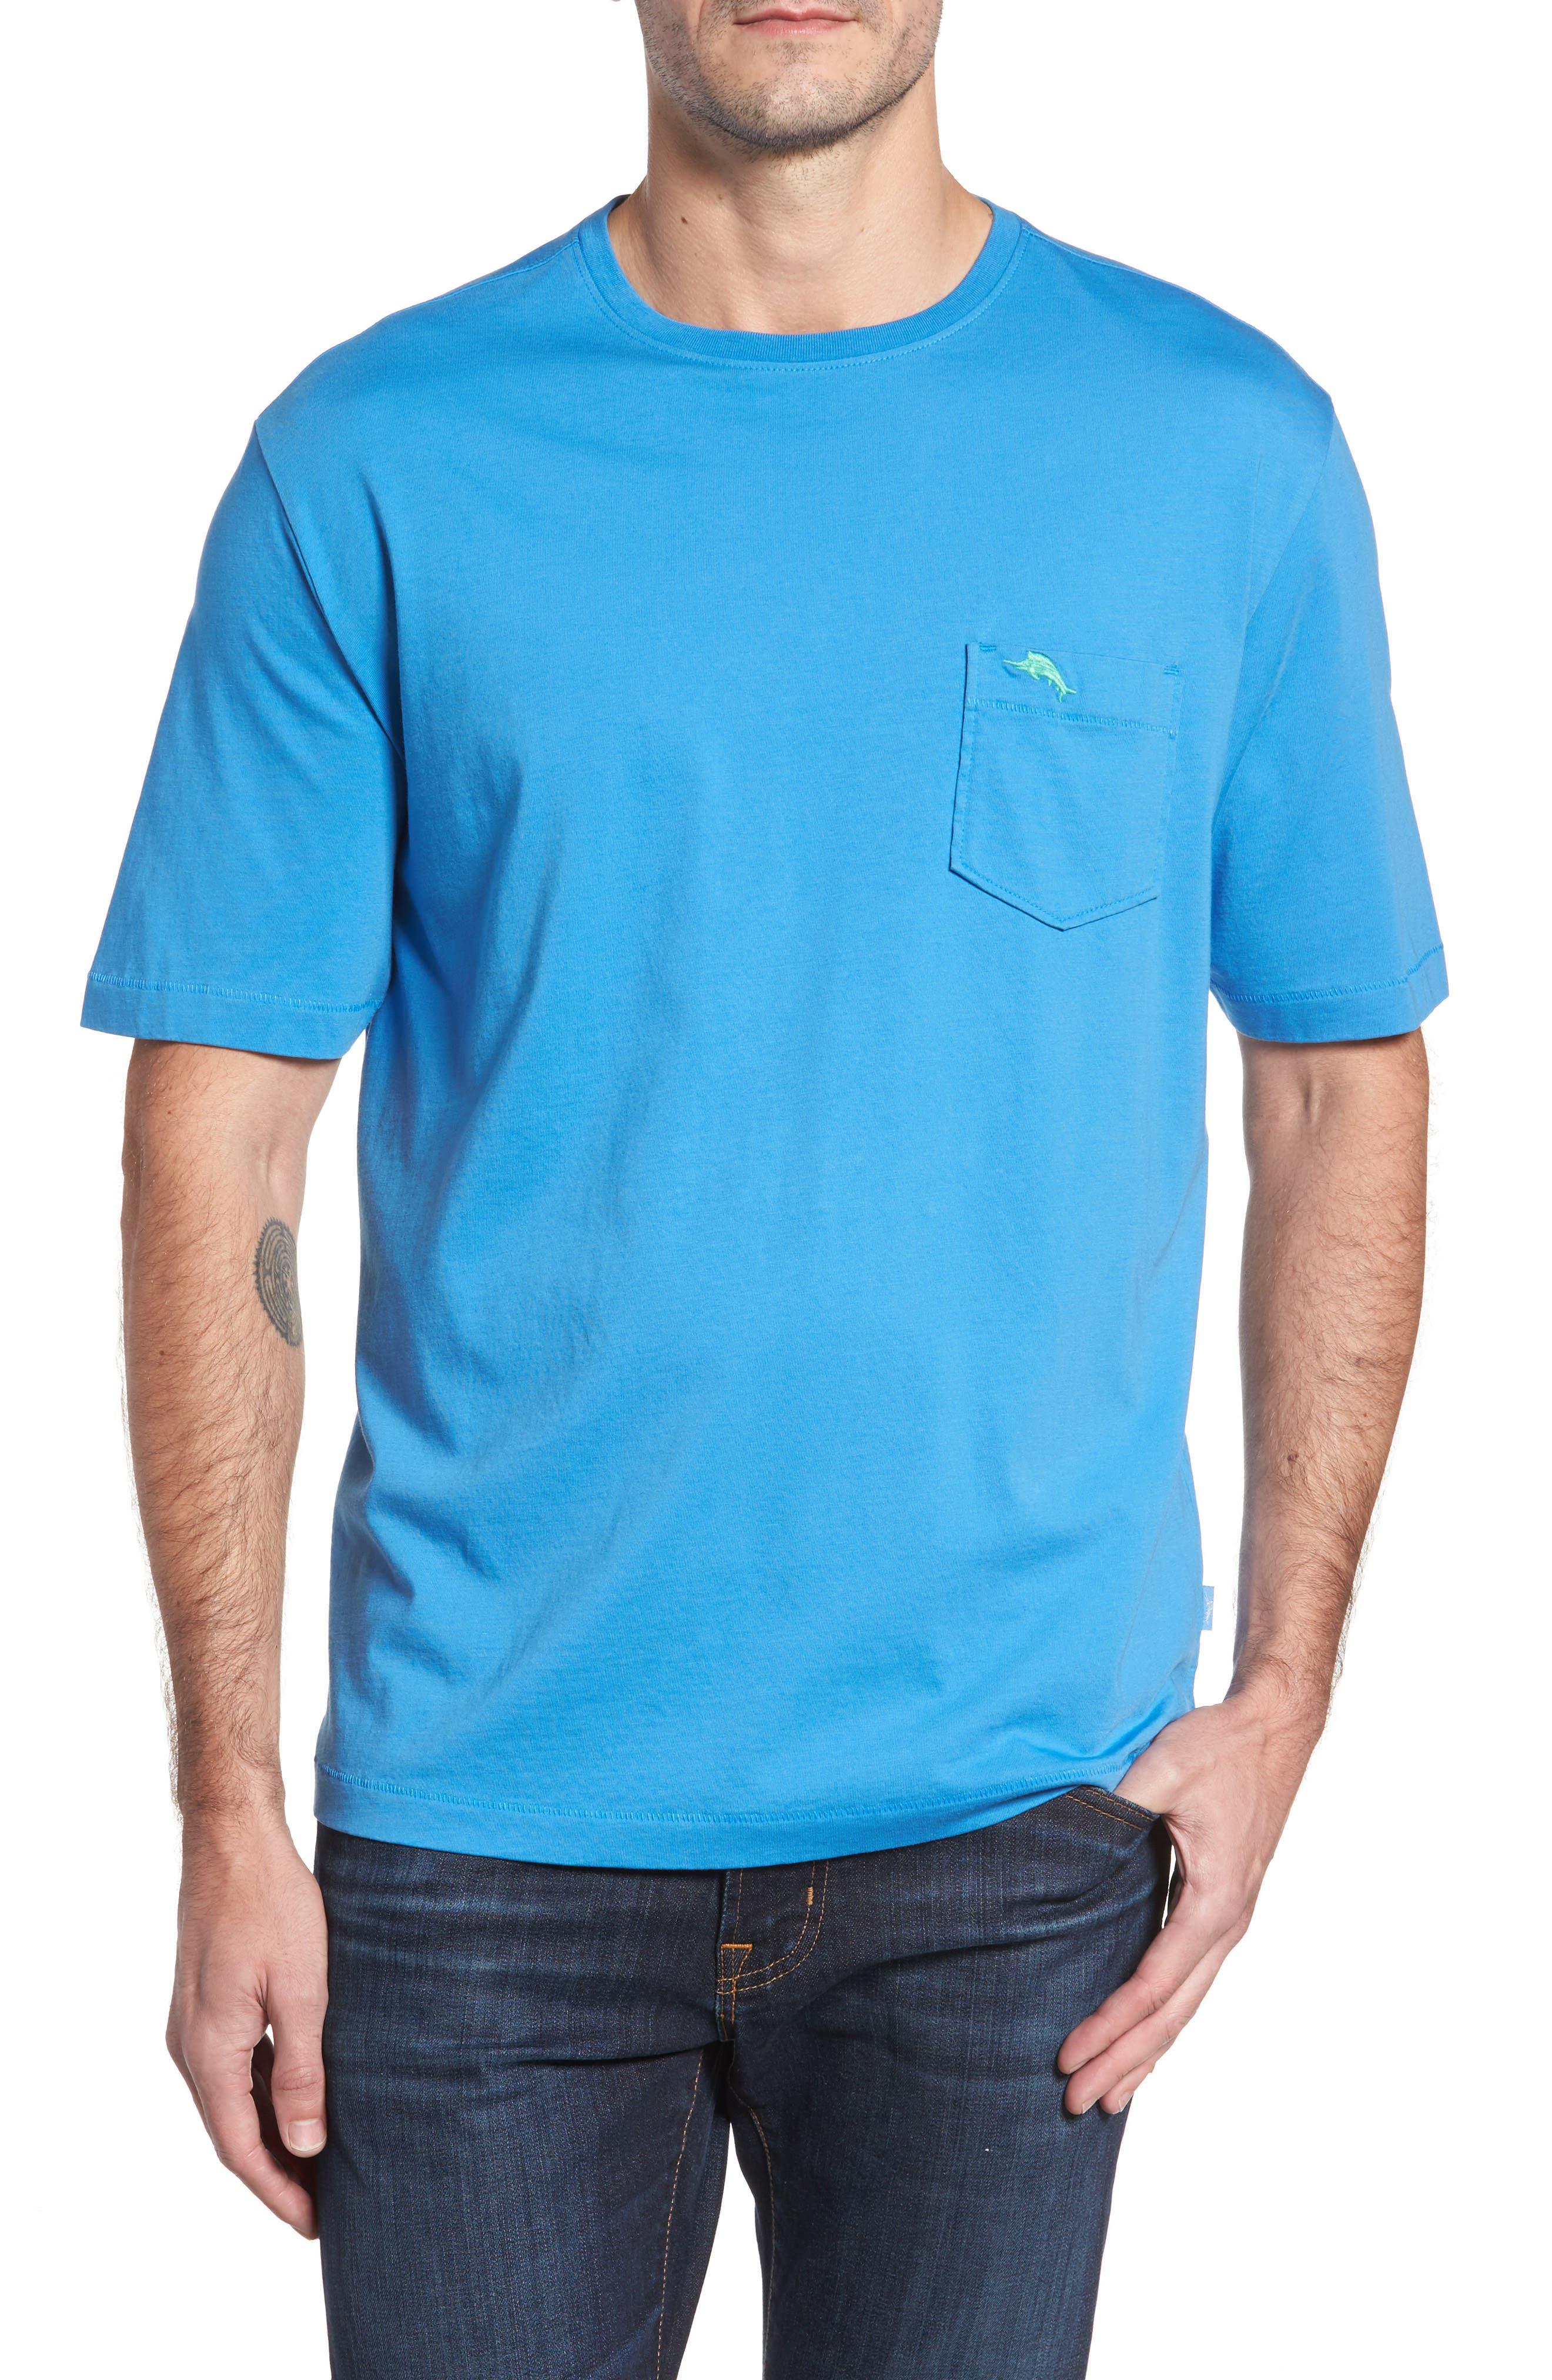 Alternate Image 1 Selected - Tommy Bahama Bali Skyline Pocket T-Shirt